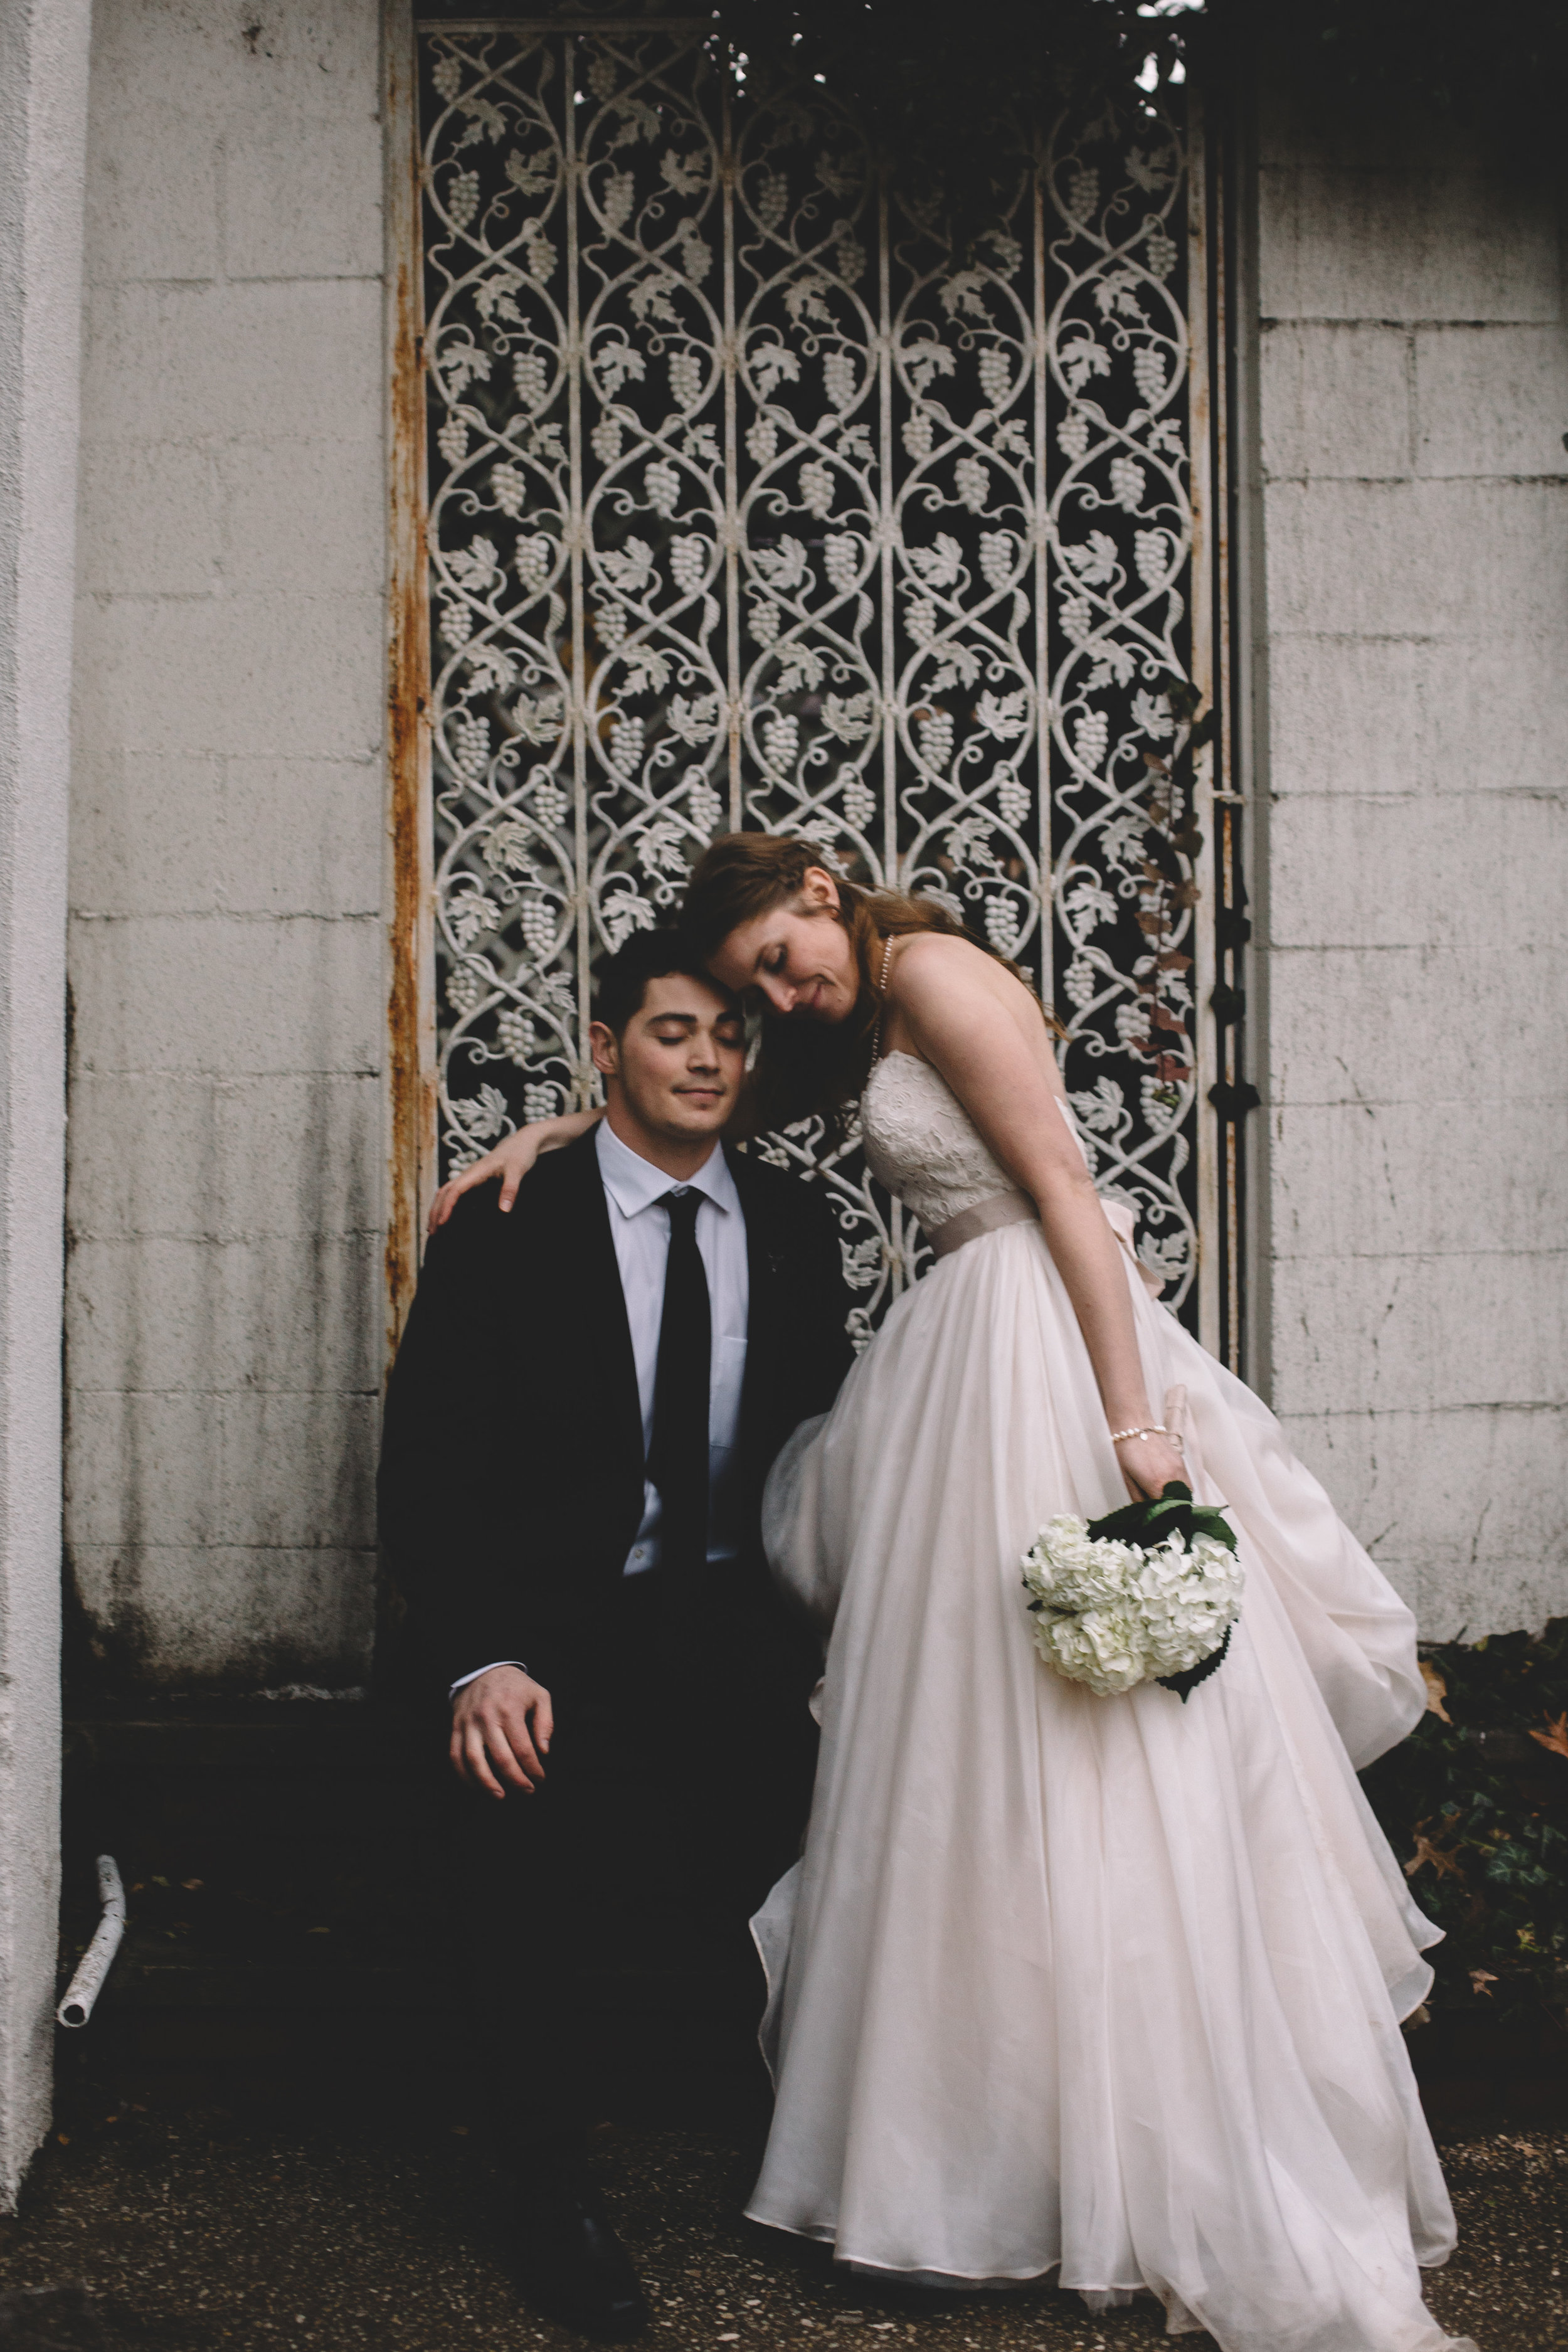 Jake + Brittney Balbas Airbnb Carriage House Wedding Evansville IN (343 of 426).jpg